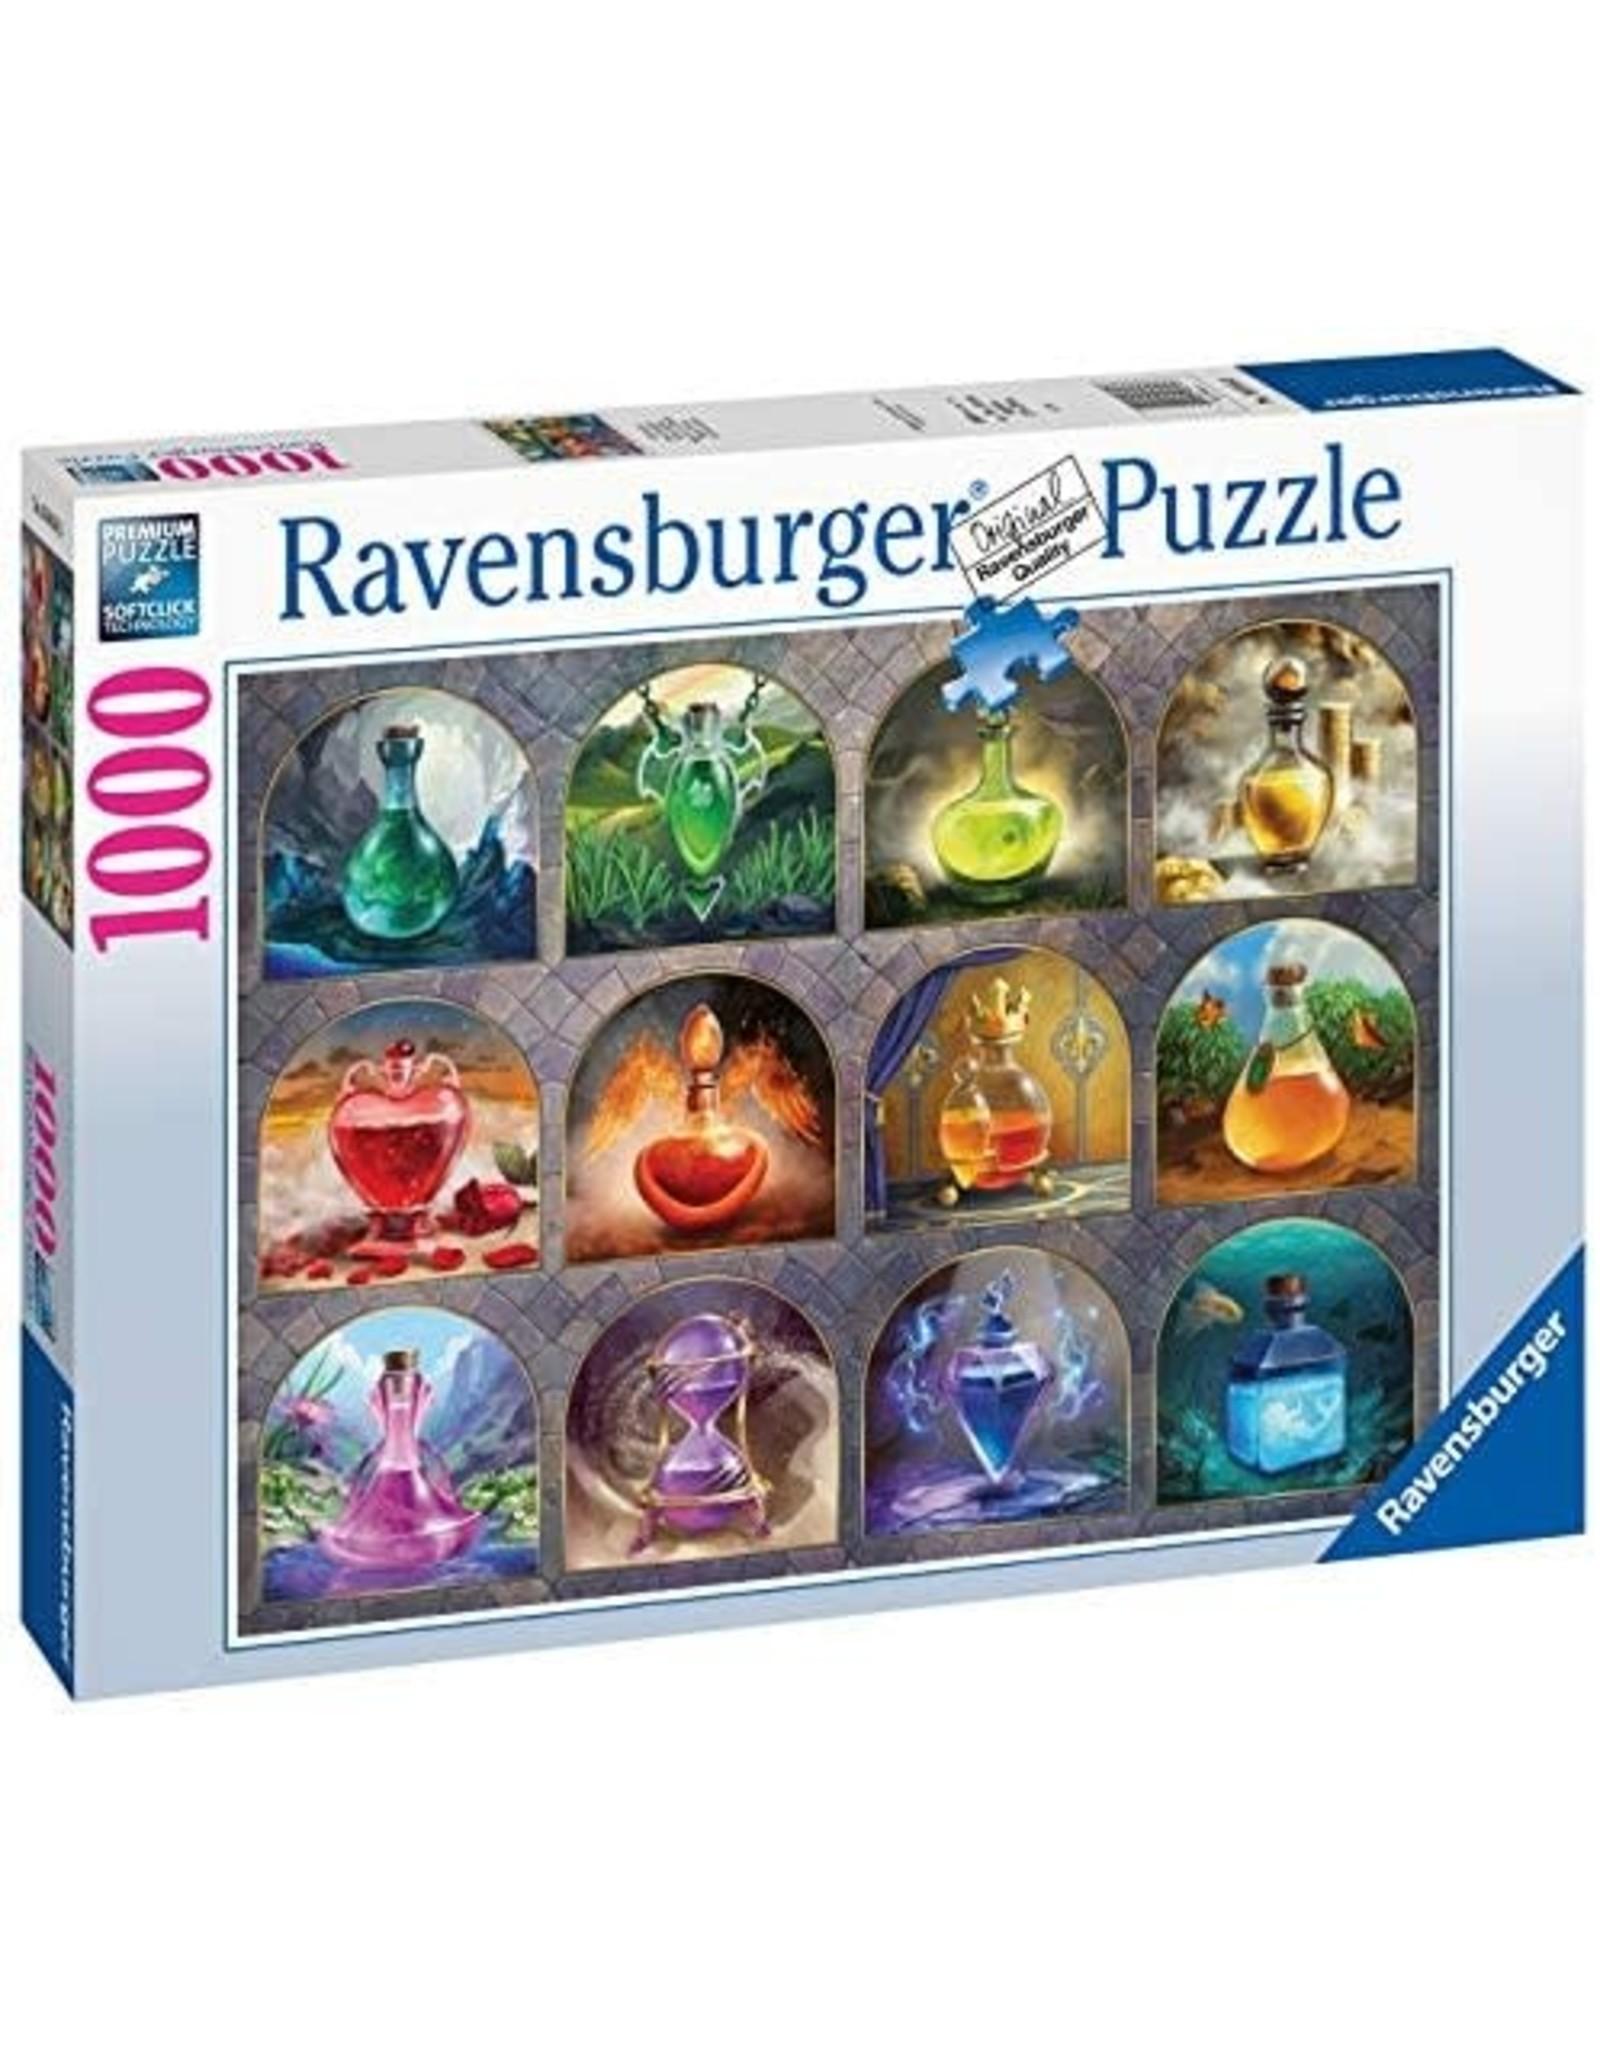 Ravensburger 1000 pcs. Magical Potions Puzzle